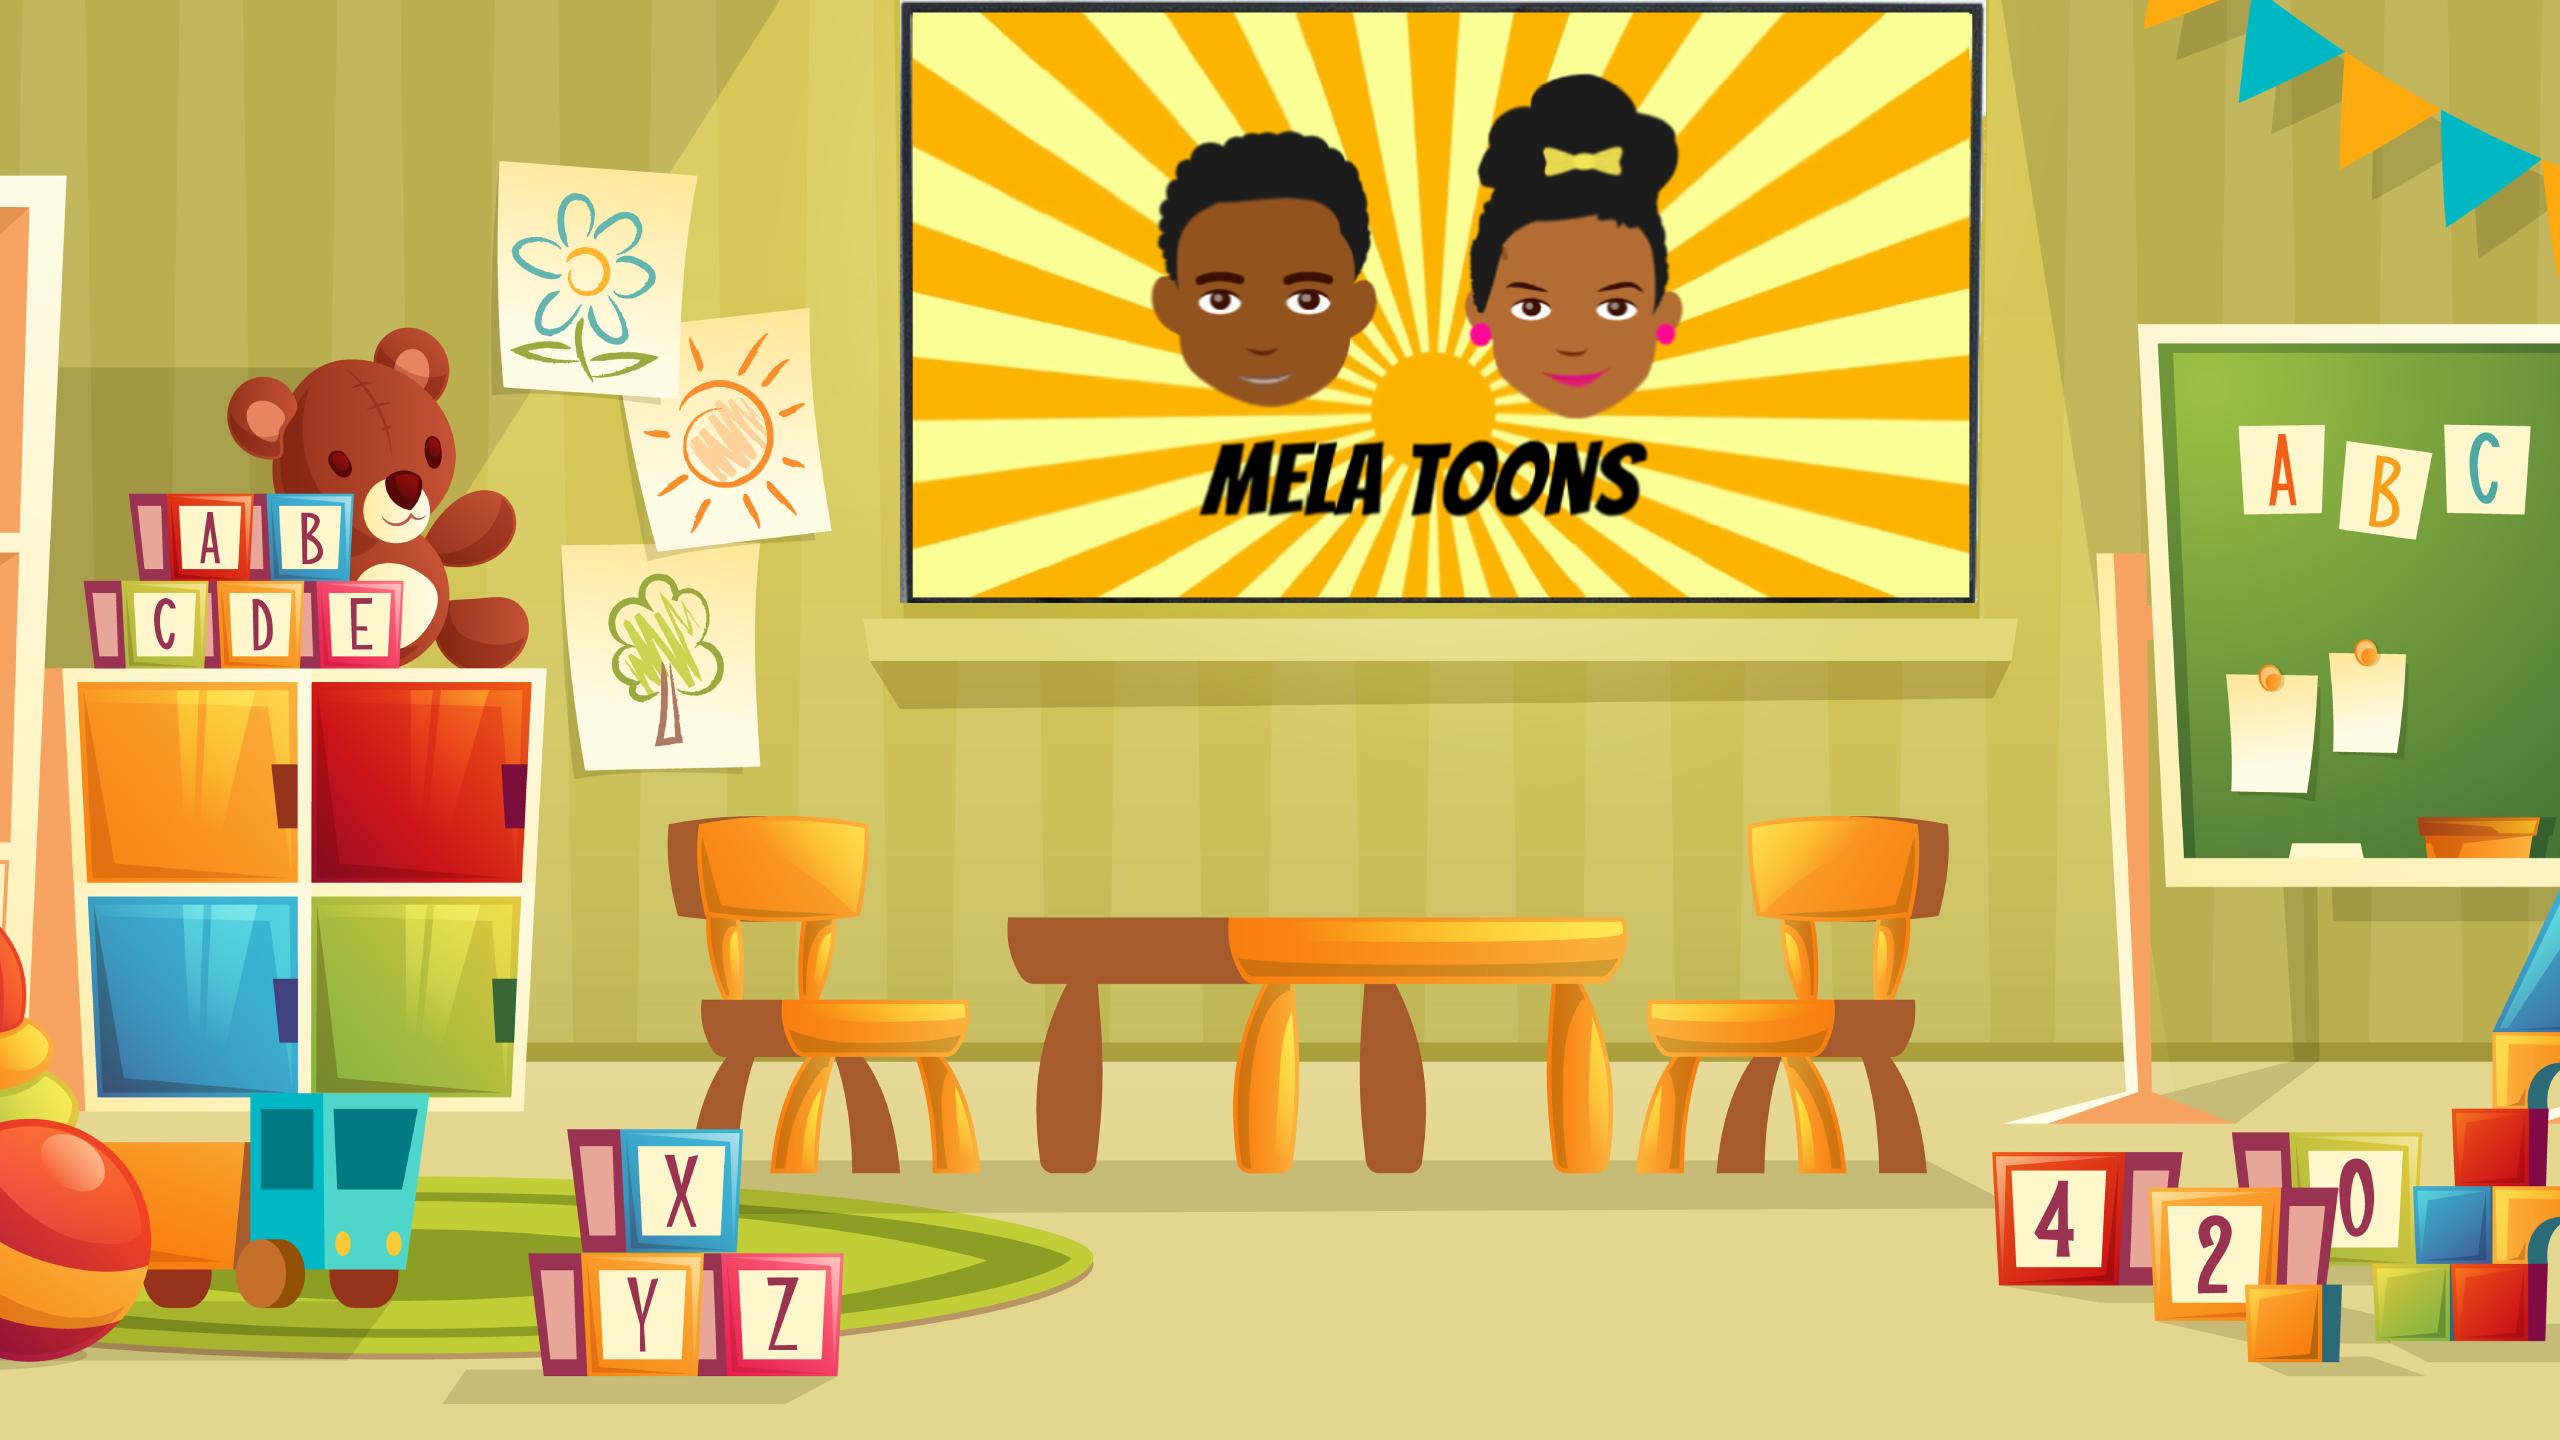 Mela Toons